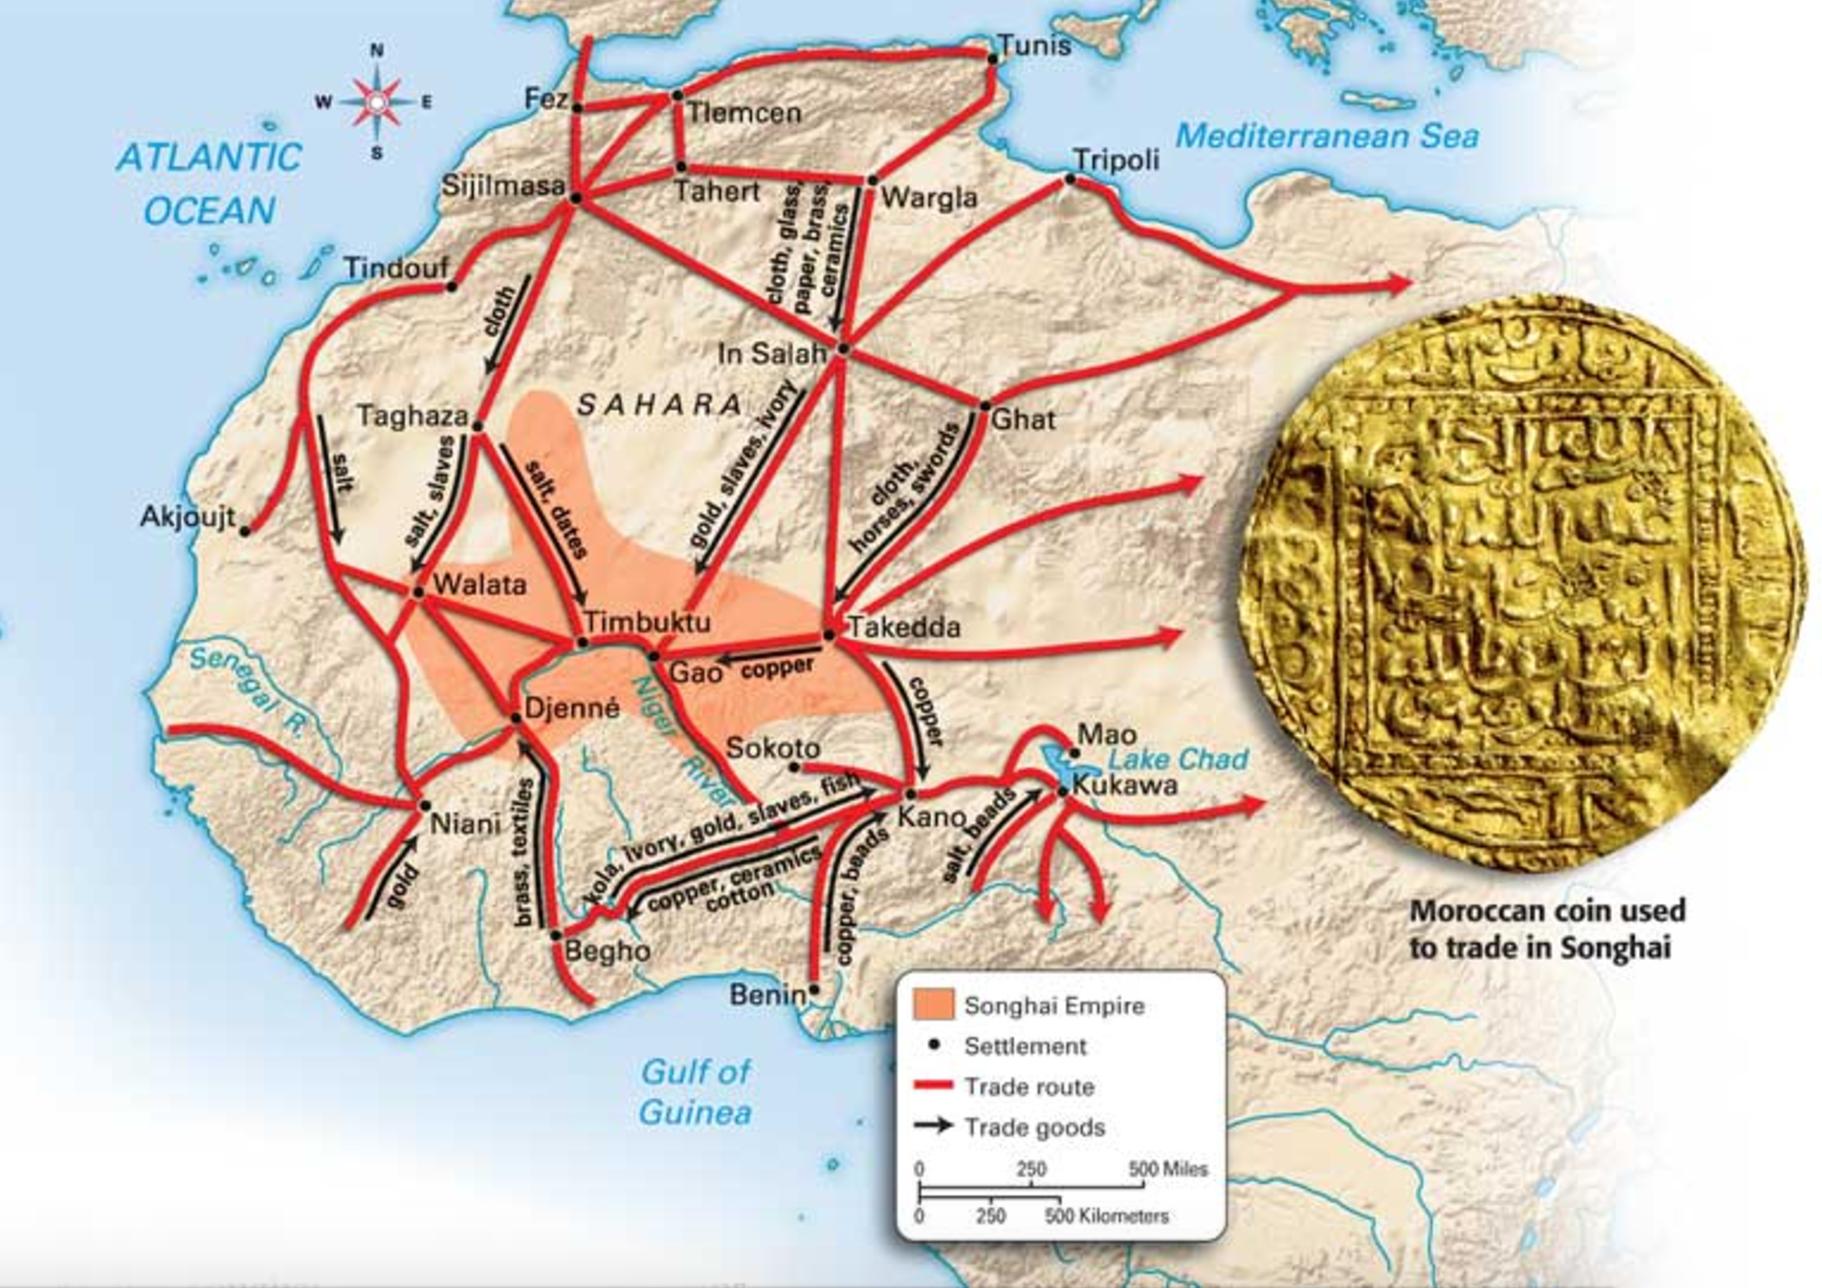 Songhai Africa Map.Songhai Empire Trade Routes Bantu Maps